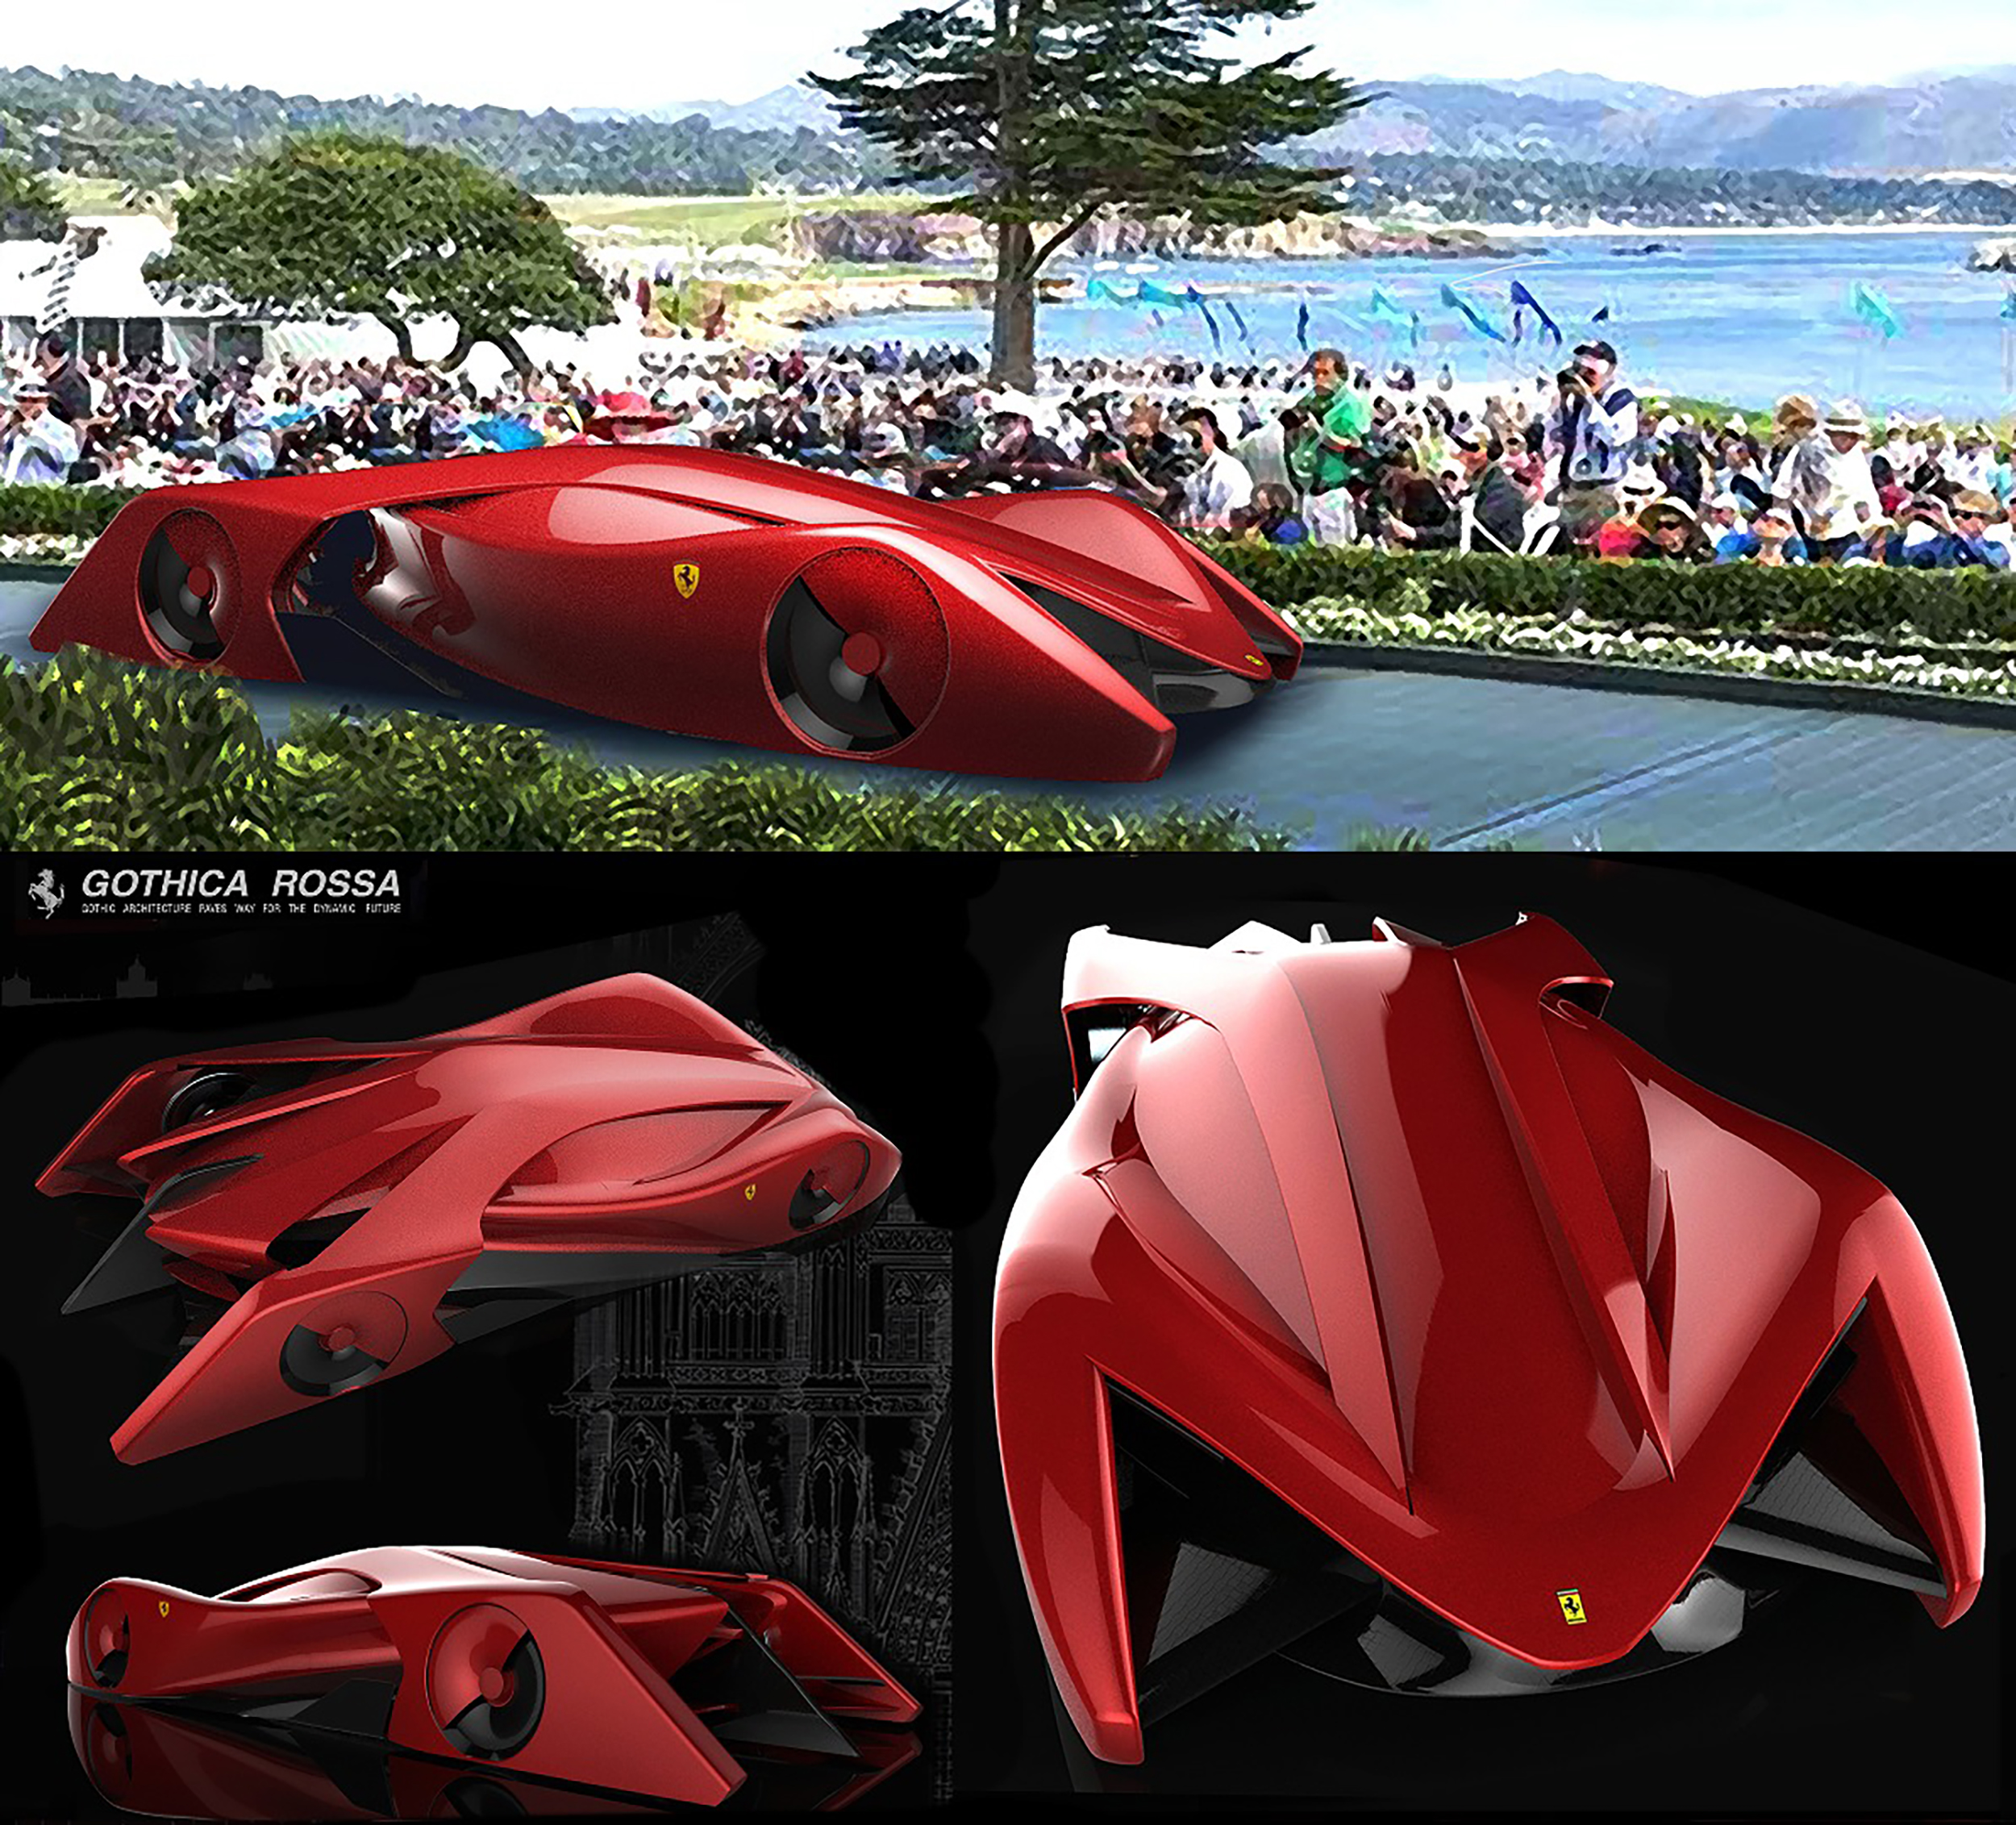 Ferrari Designer: Ferrari Gothica Rossa 2025 Electric Hypercar Concept By